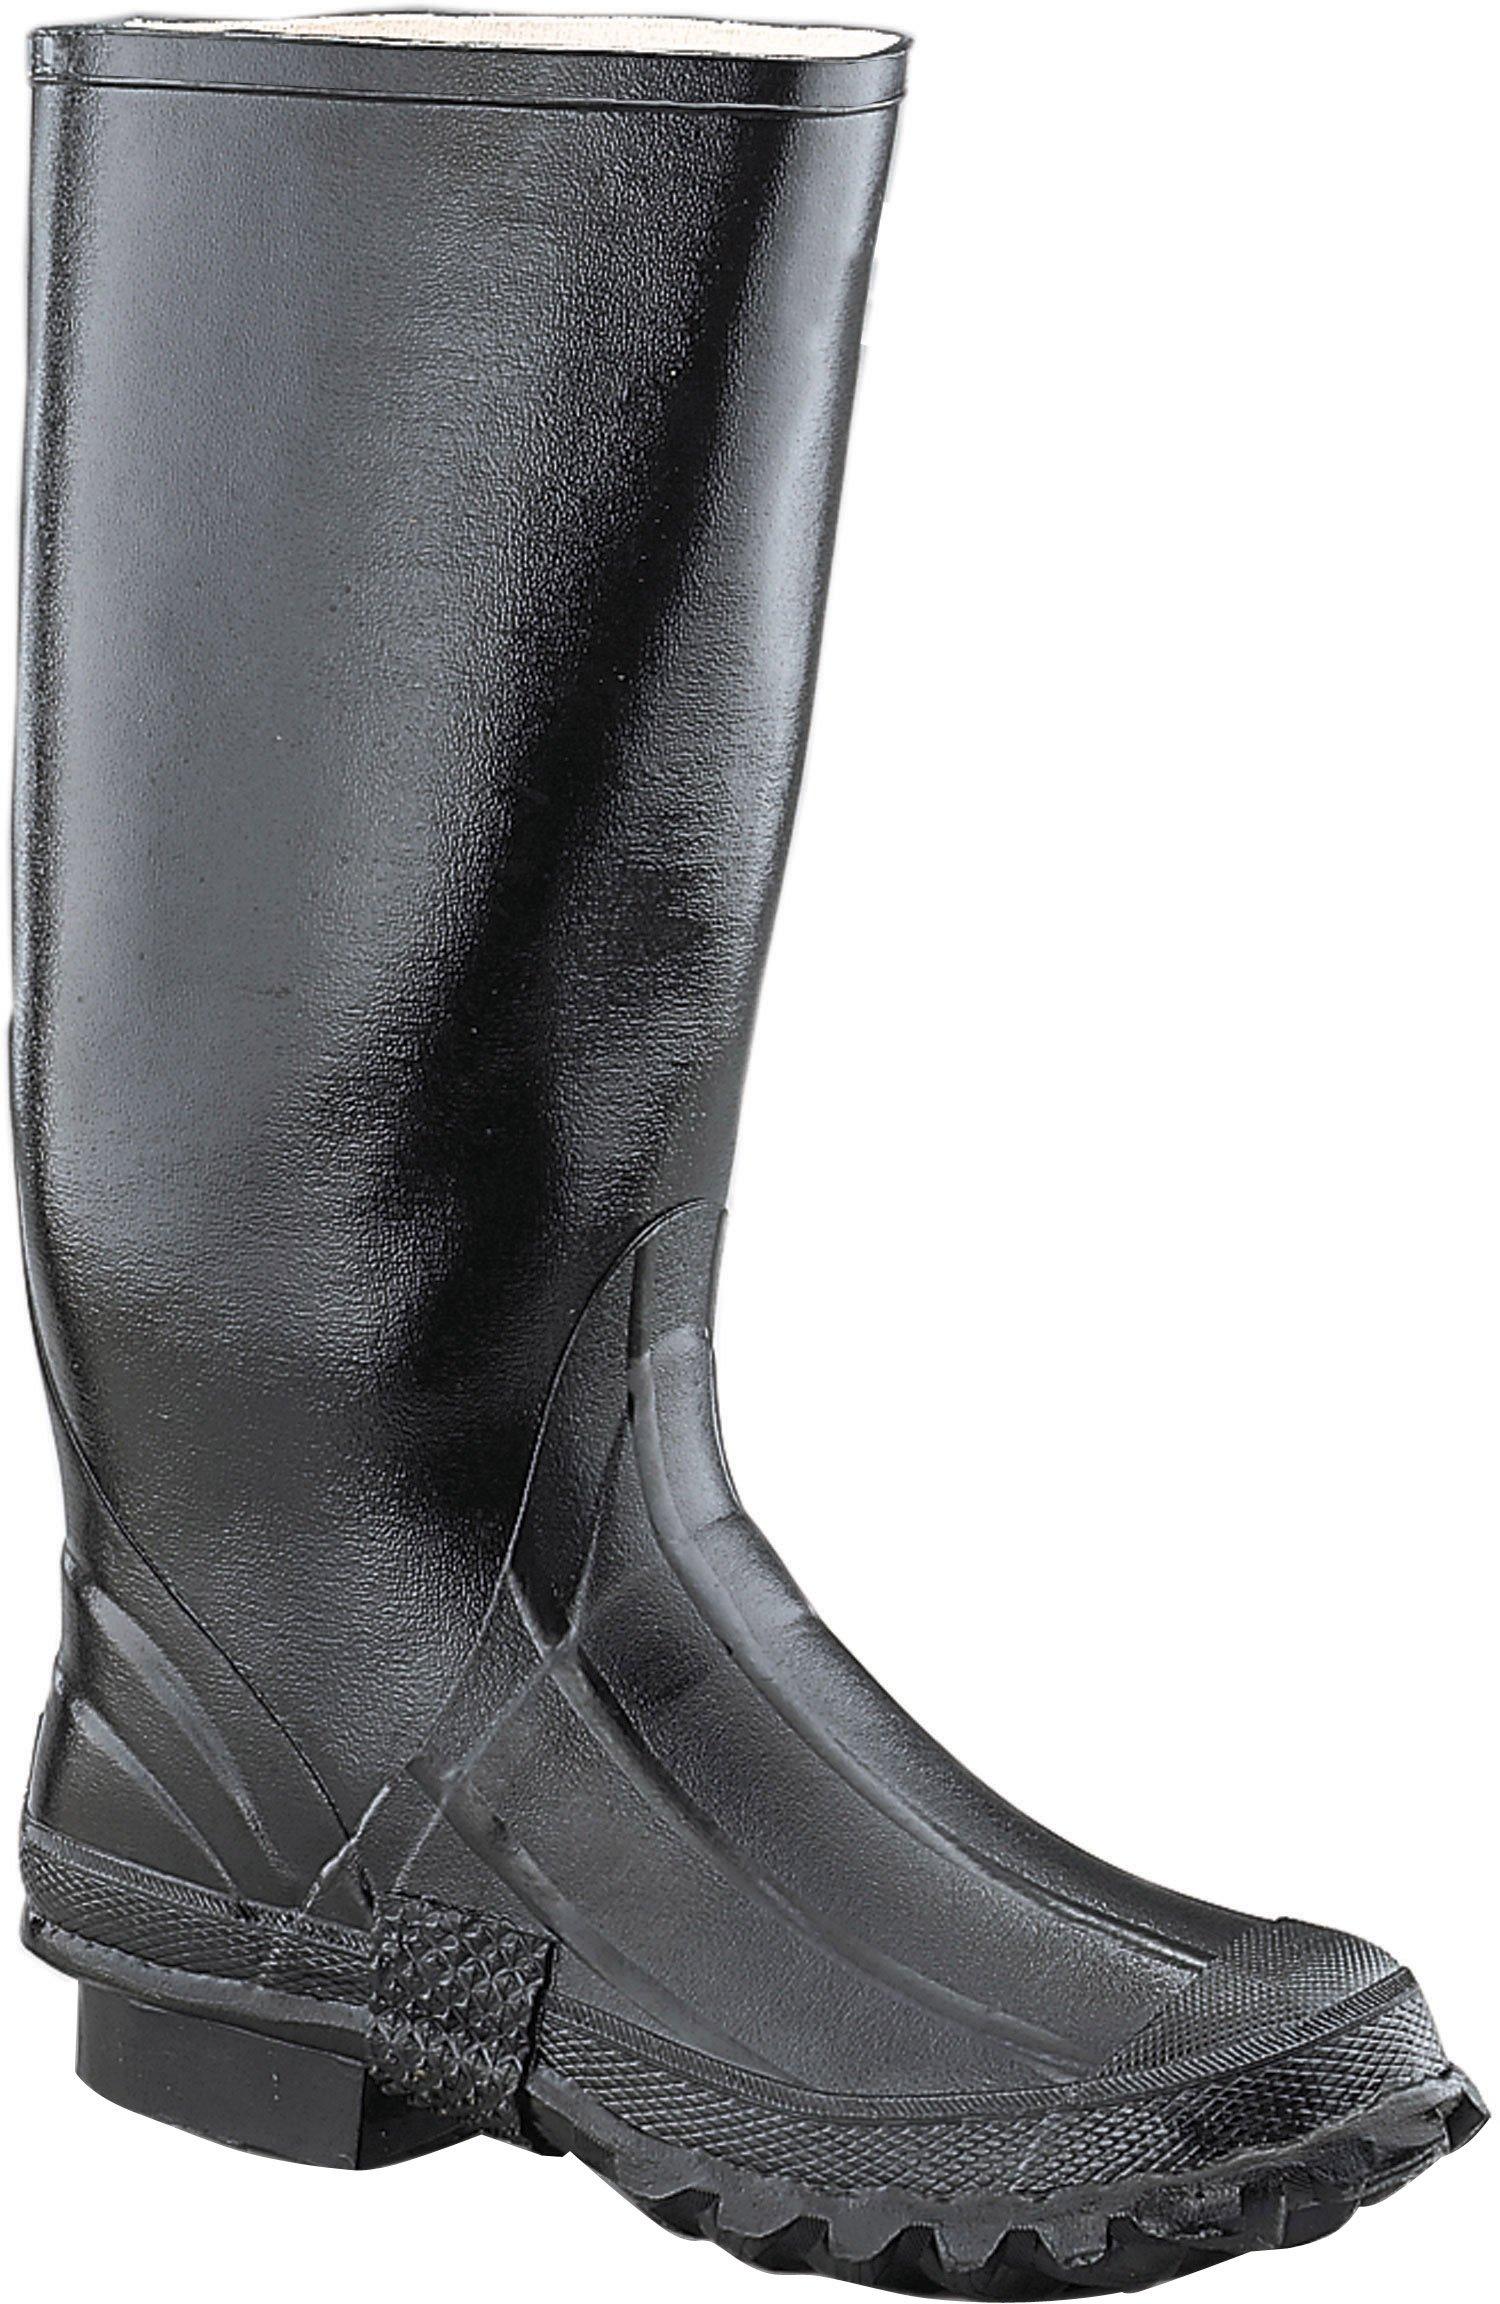 Ranger 17'' Heavy Duty Men's Rubber Irrigation Boots, Black (T111) by Honeywell